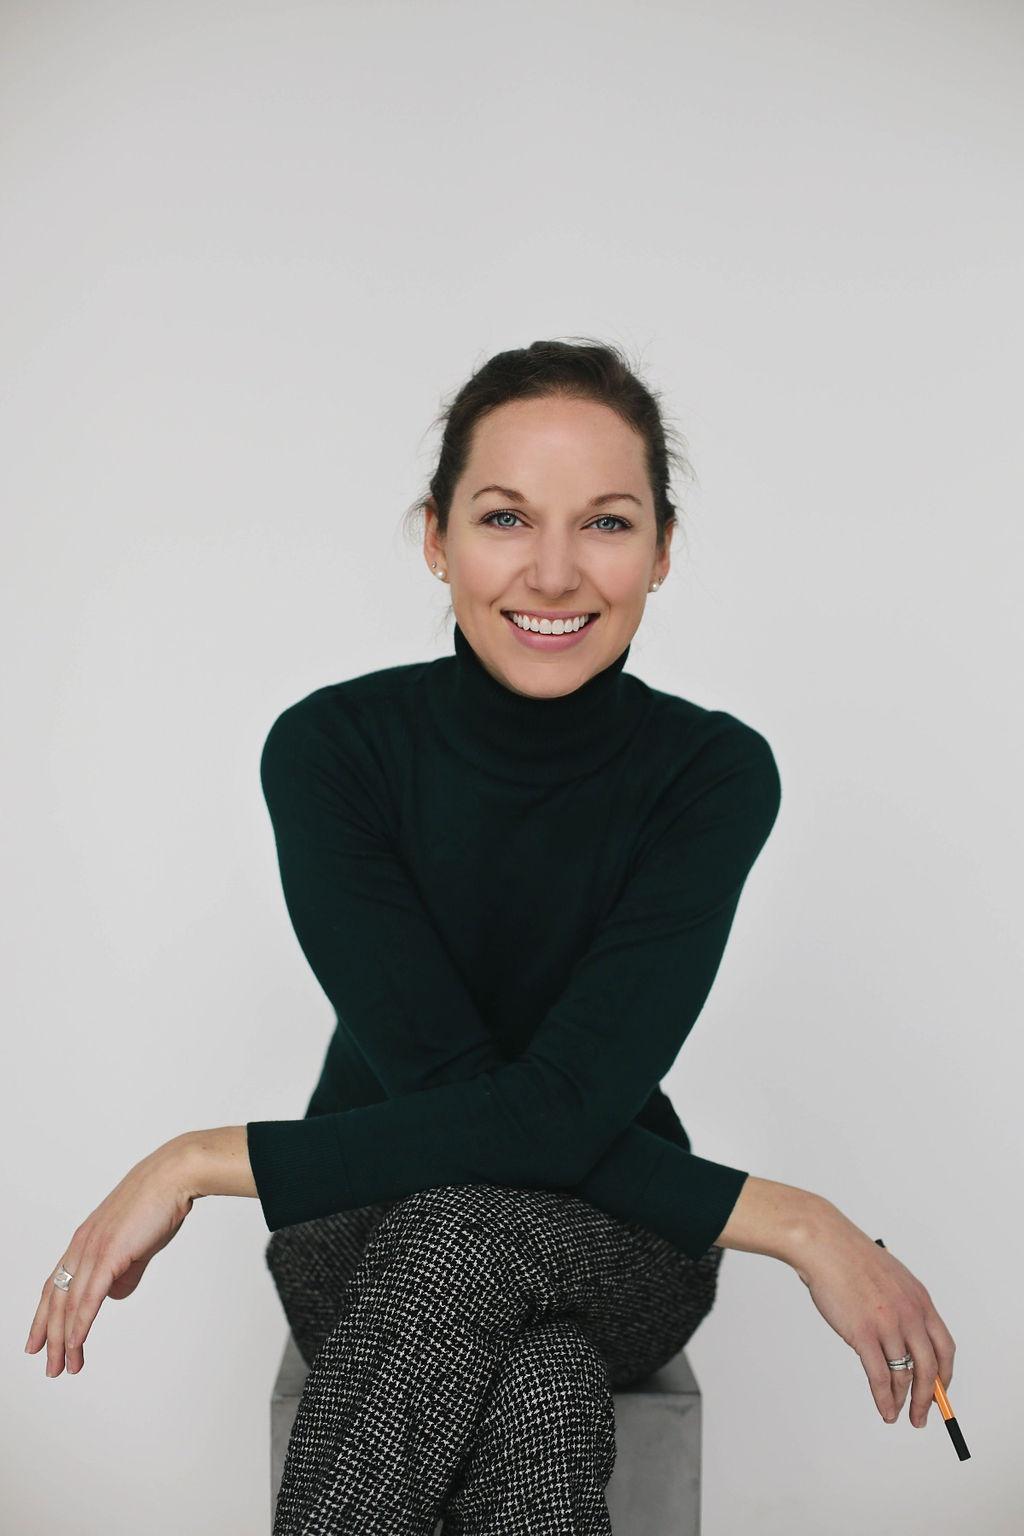 Katie Rössler, LPC, NCC